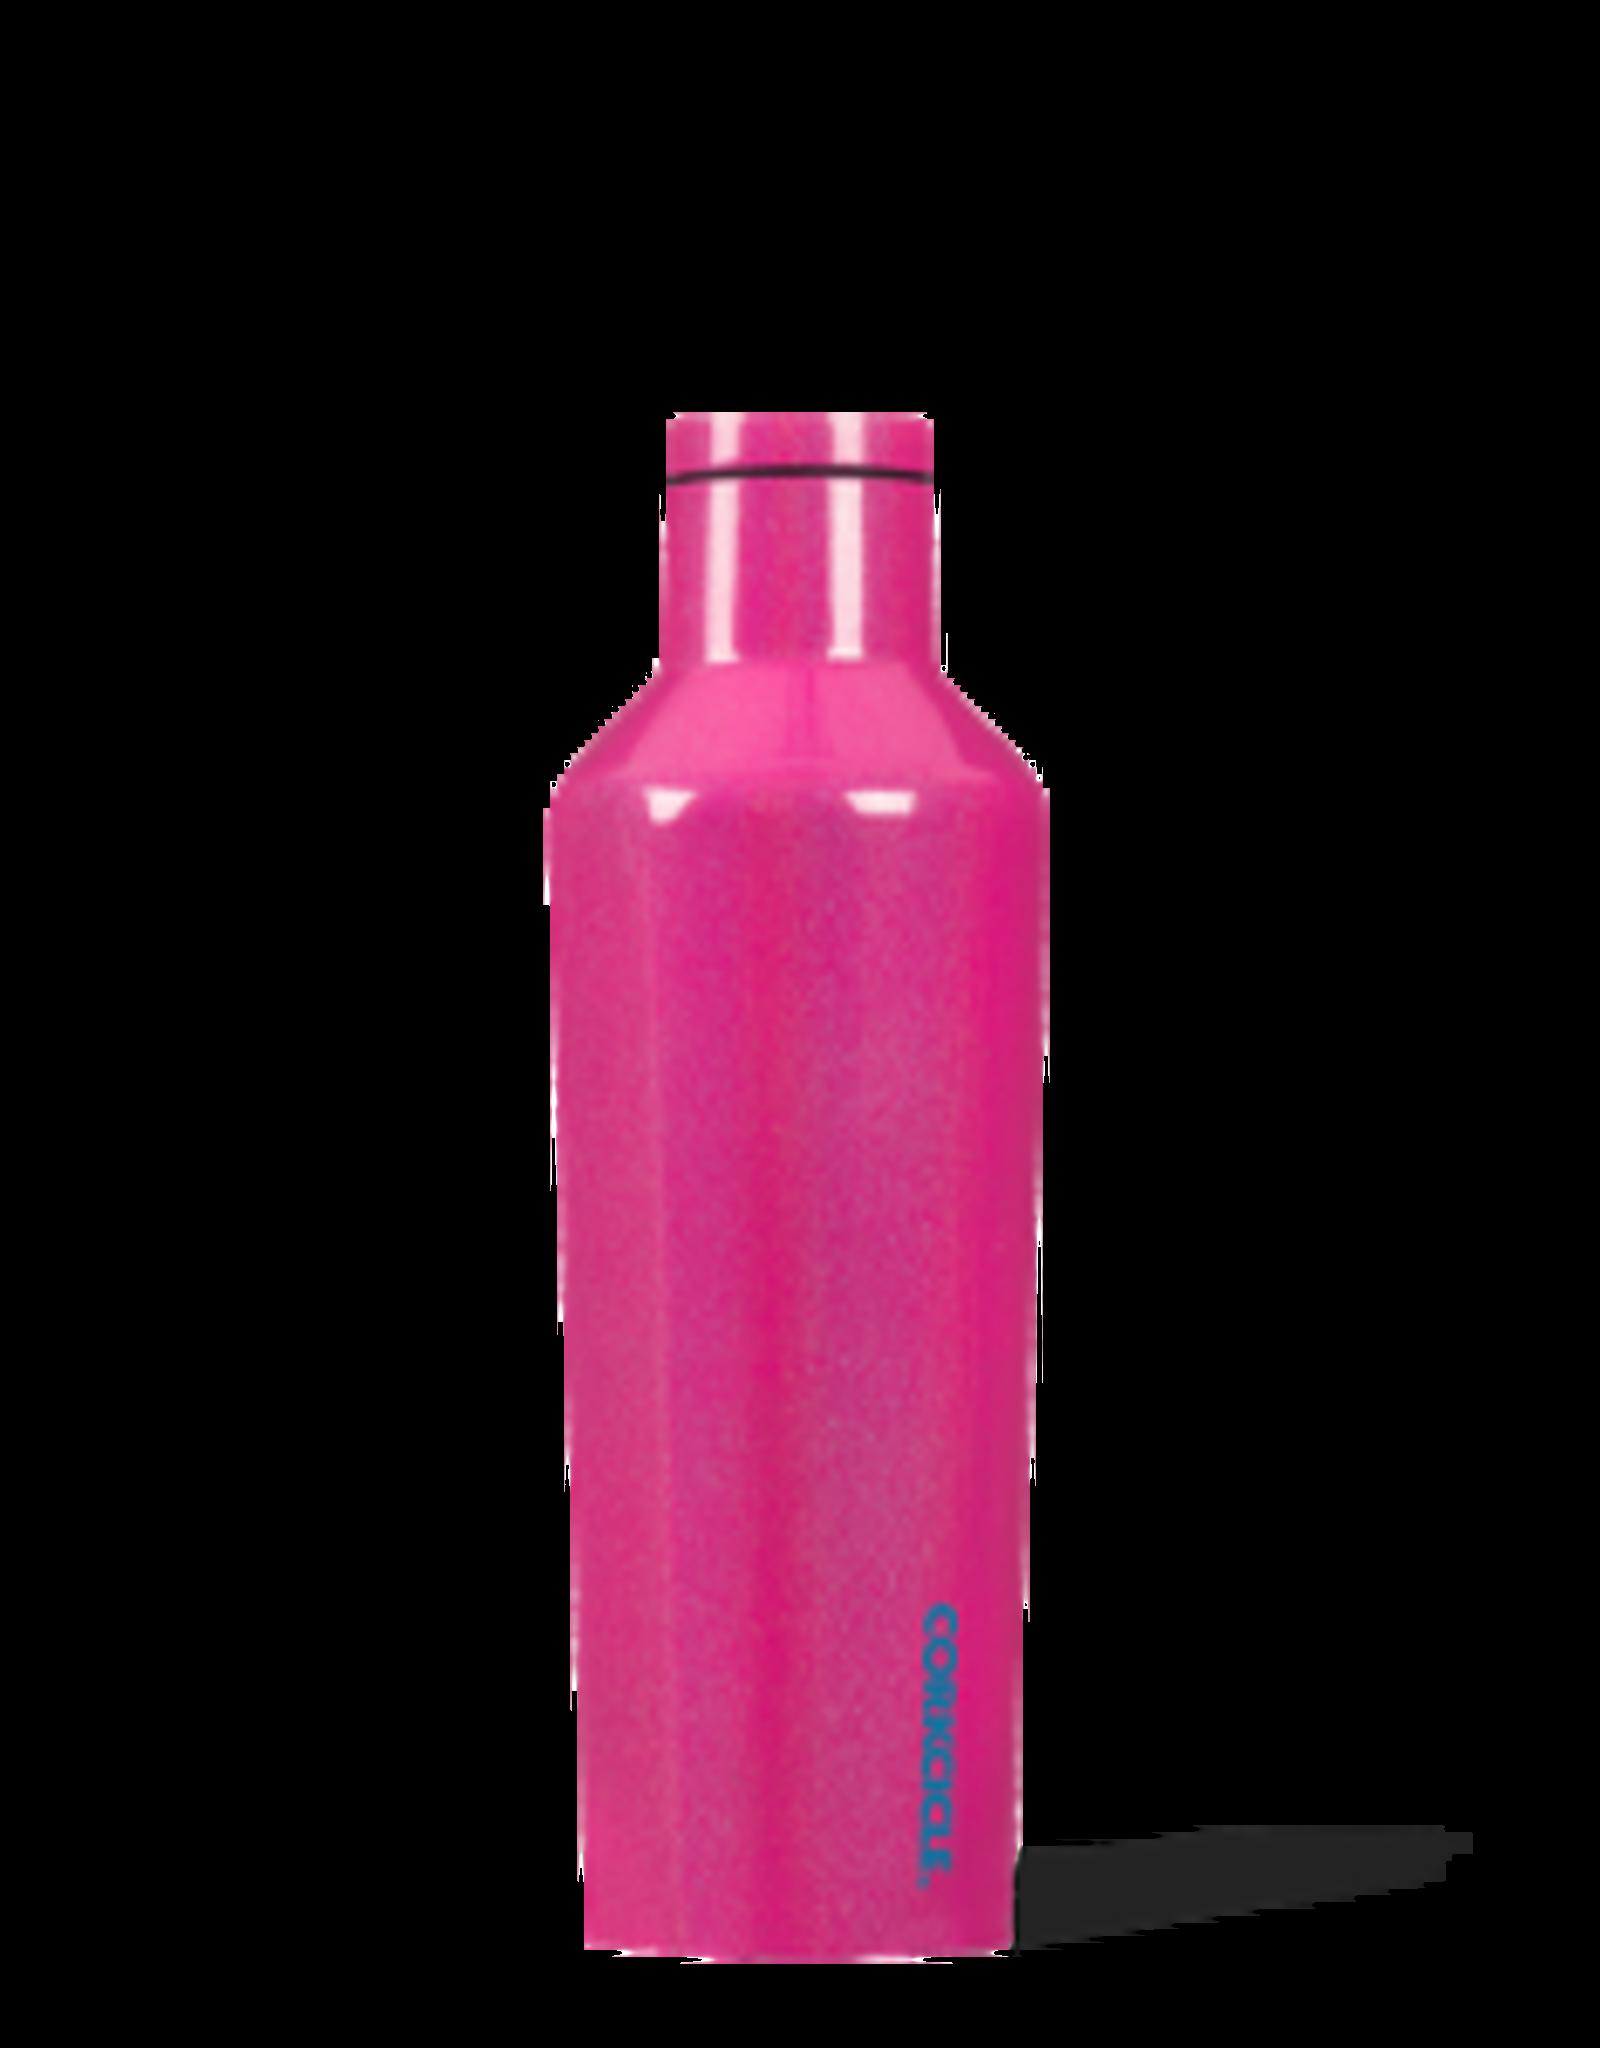 Corkcicle Canteen- 16oz Unicorn Sparkle Pink